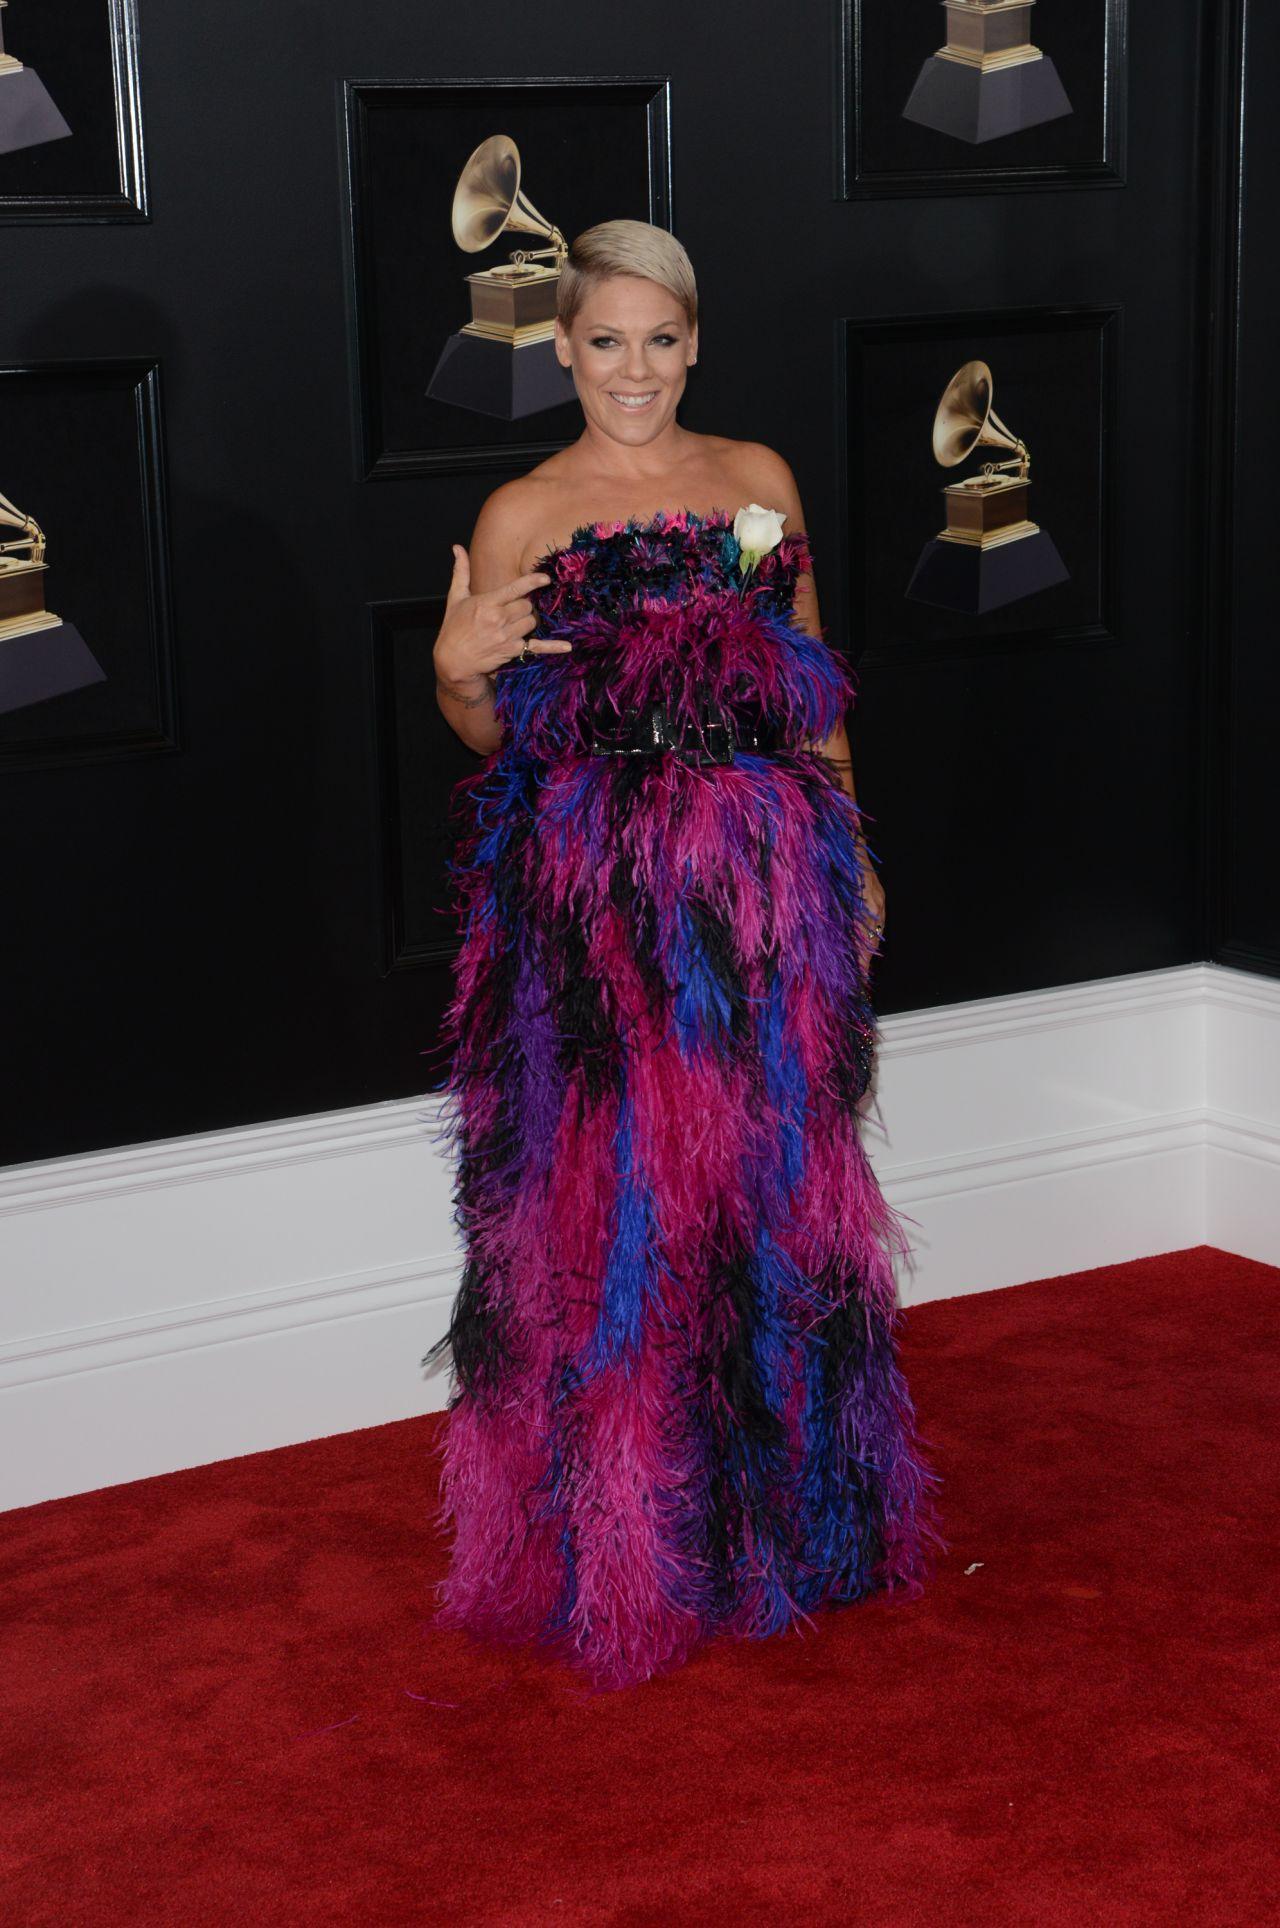 http://celebmafia.com/wp-content/uploads/2018/01/pink-2018-grammy-awards-in-new-york-3.jpg